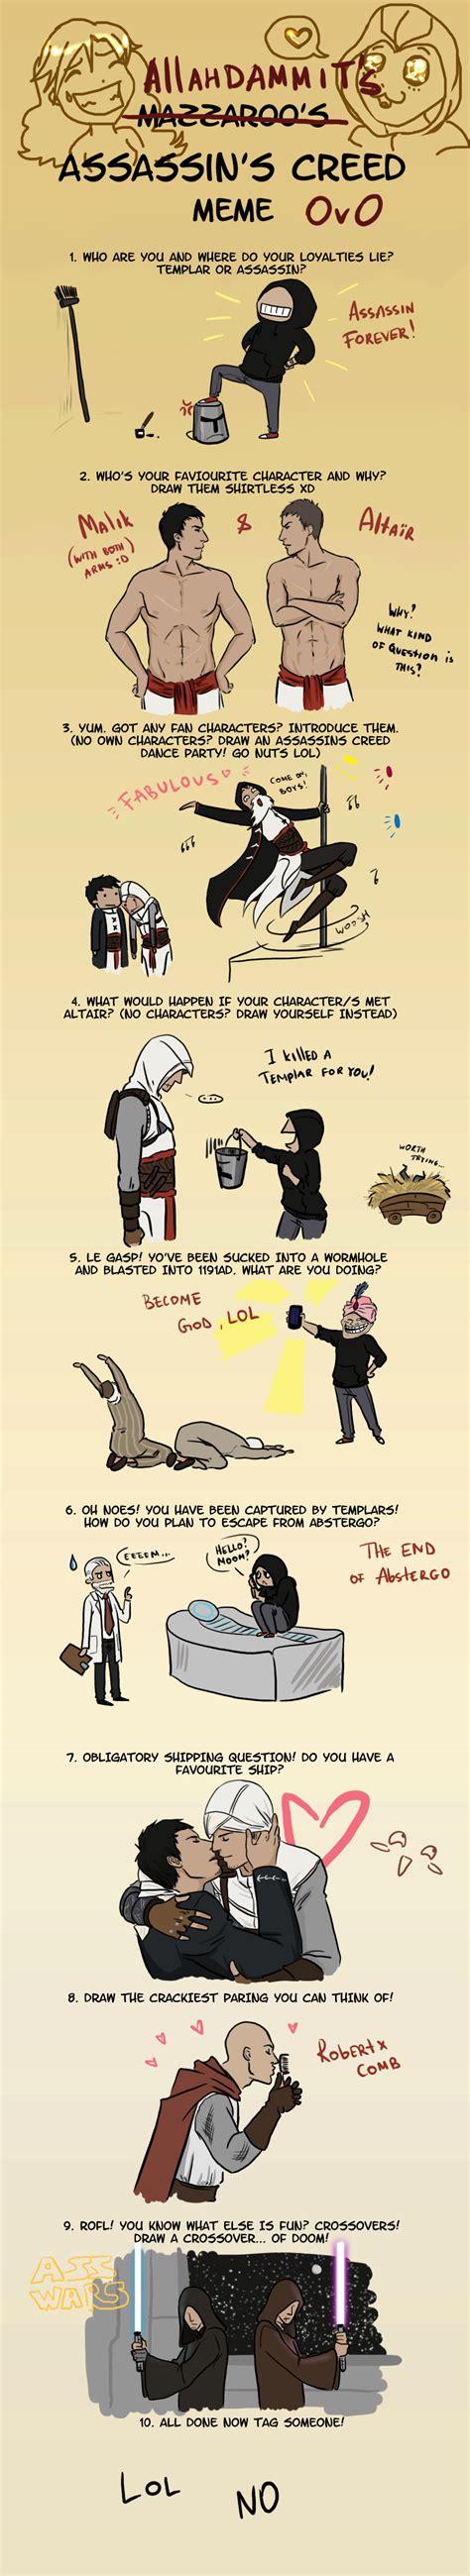 Assassins Creed 4 Memes - assassin s creed meme by allahdammit on deviantart